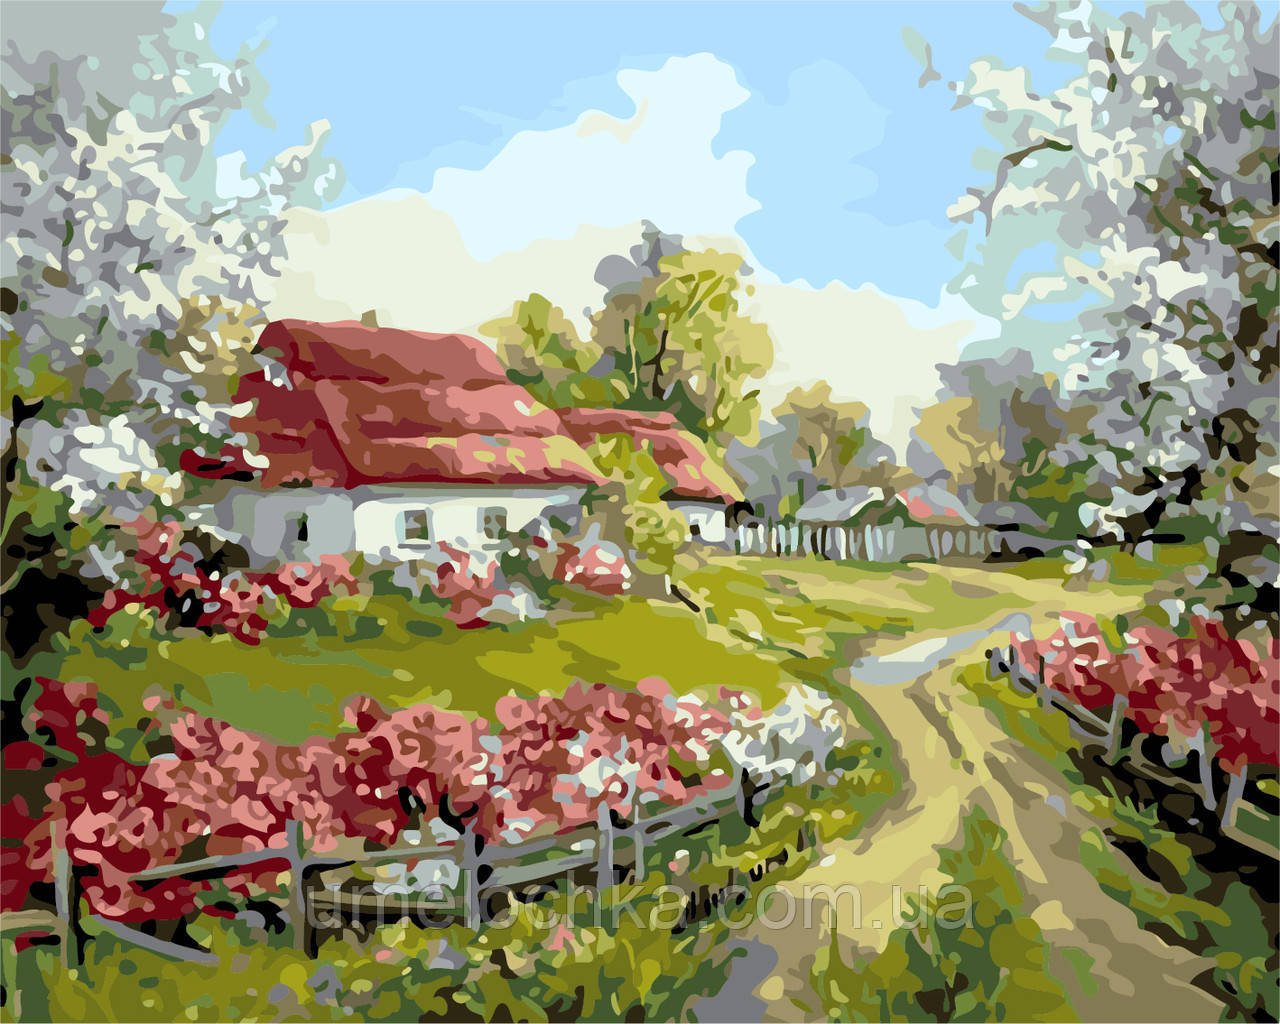 Рисование по номерам Родное село (AS0156) 40 х 50 см ArtStory